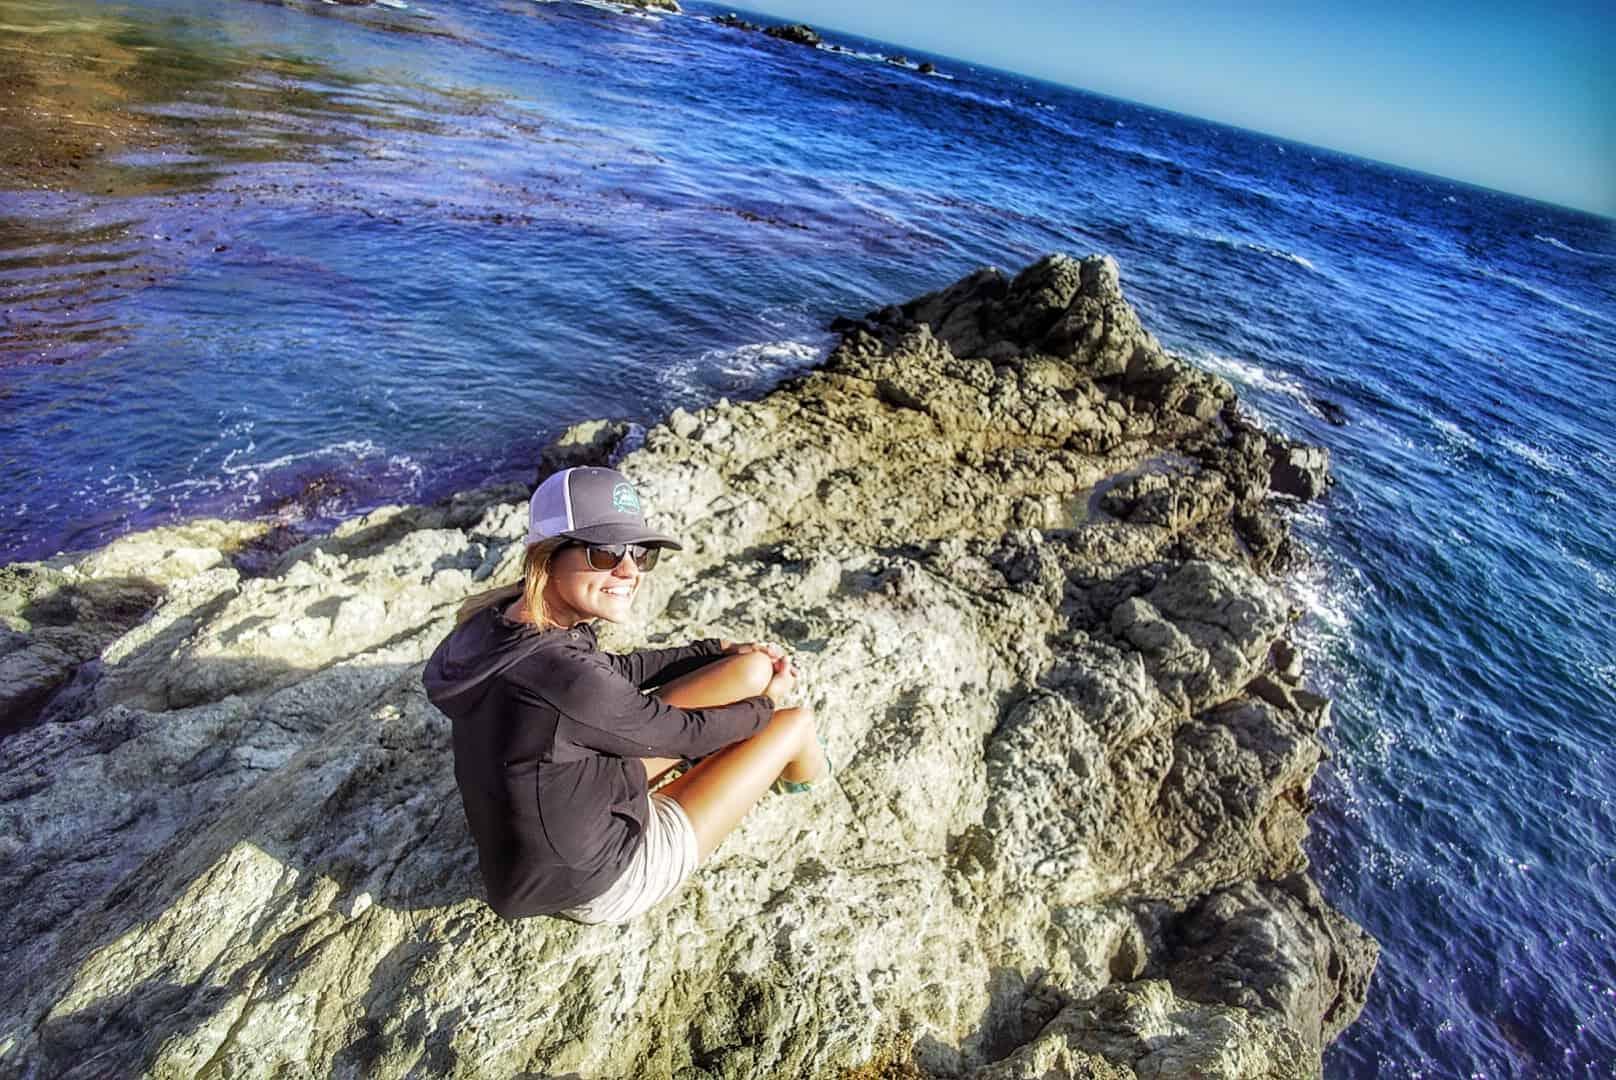 DSC00398 01 - Vlog: Road Trip to Big Sur California